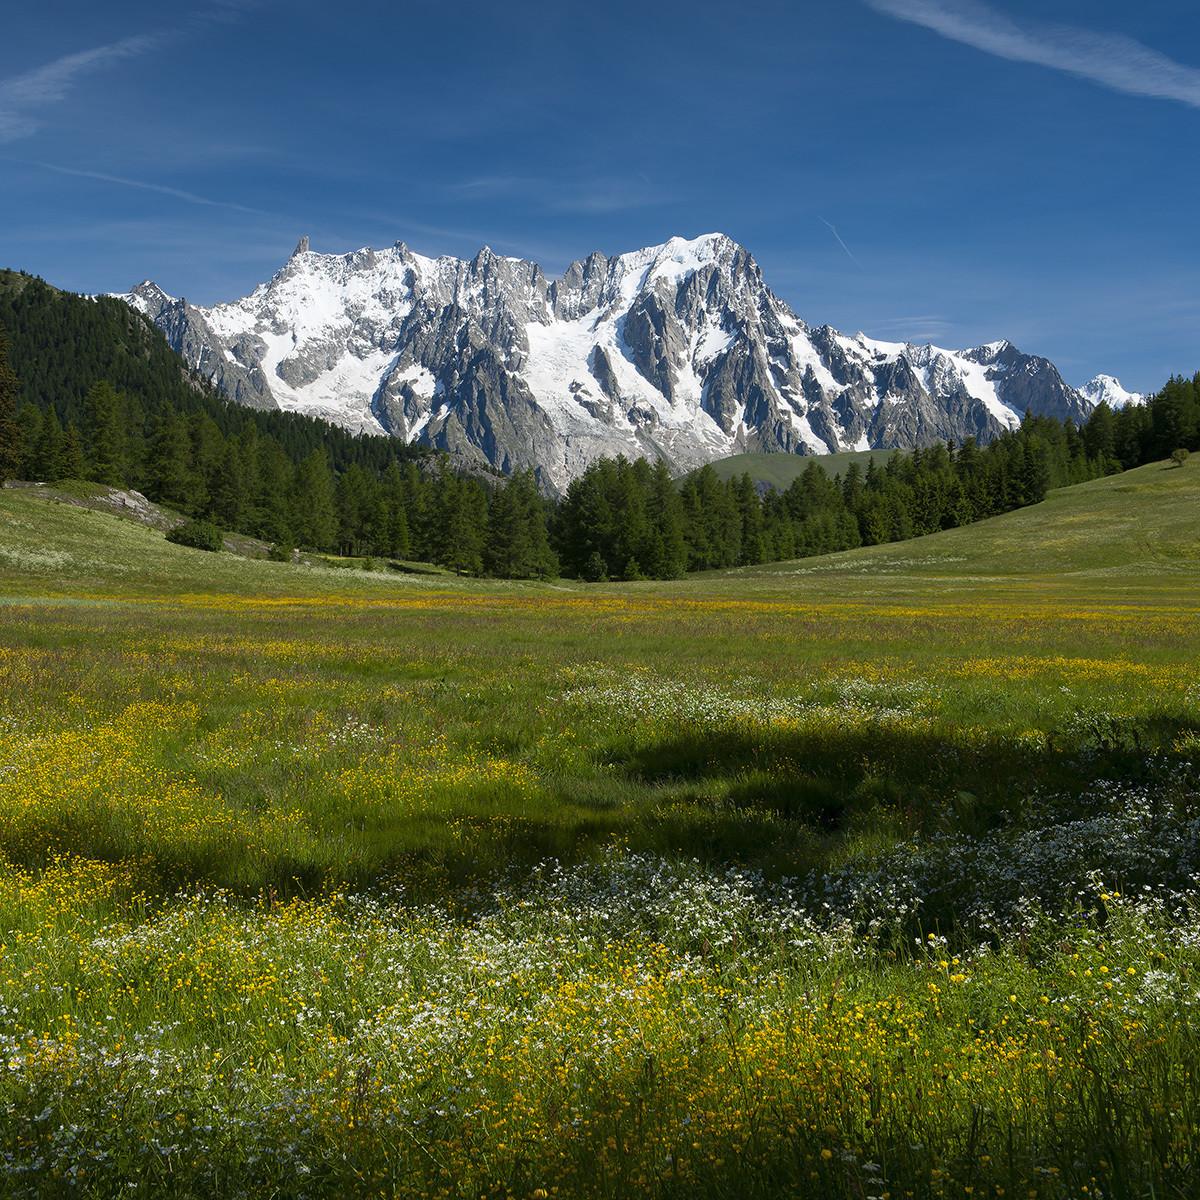 Petosan - La-Thuile - Monte Bianco